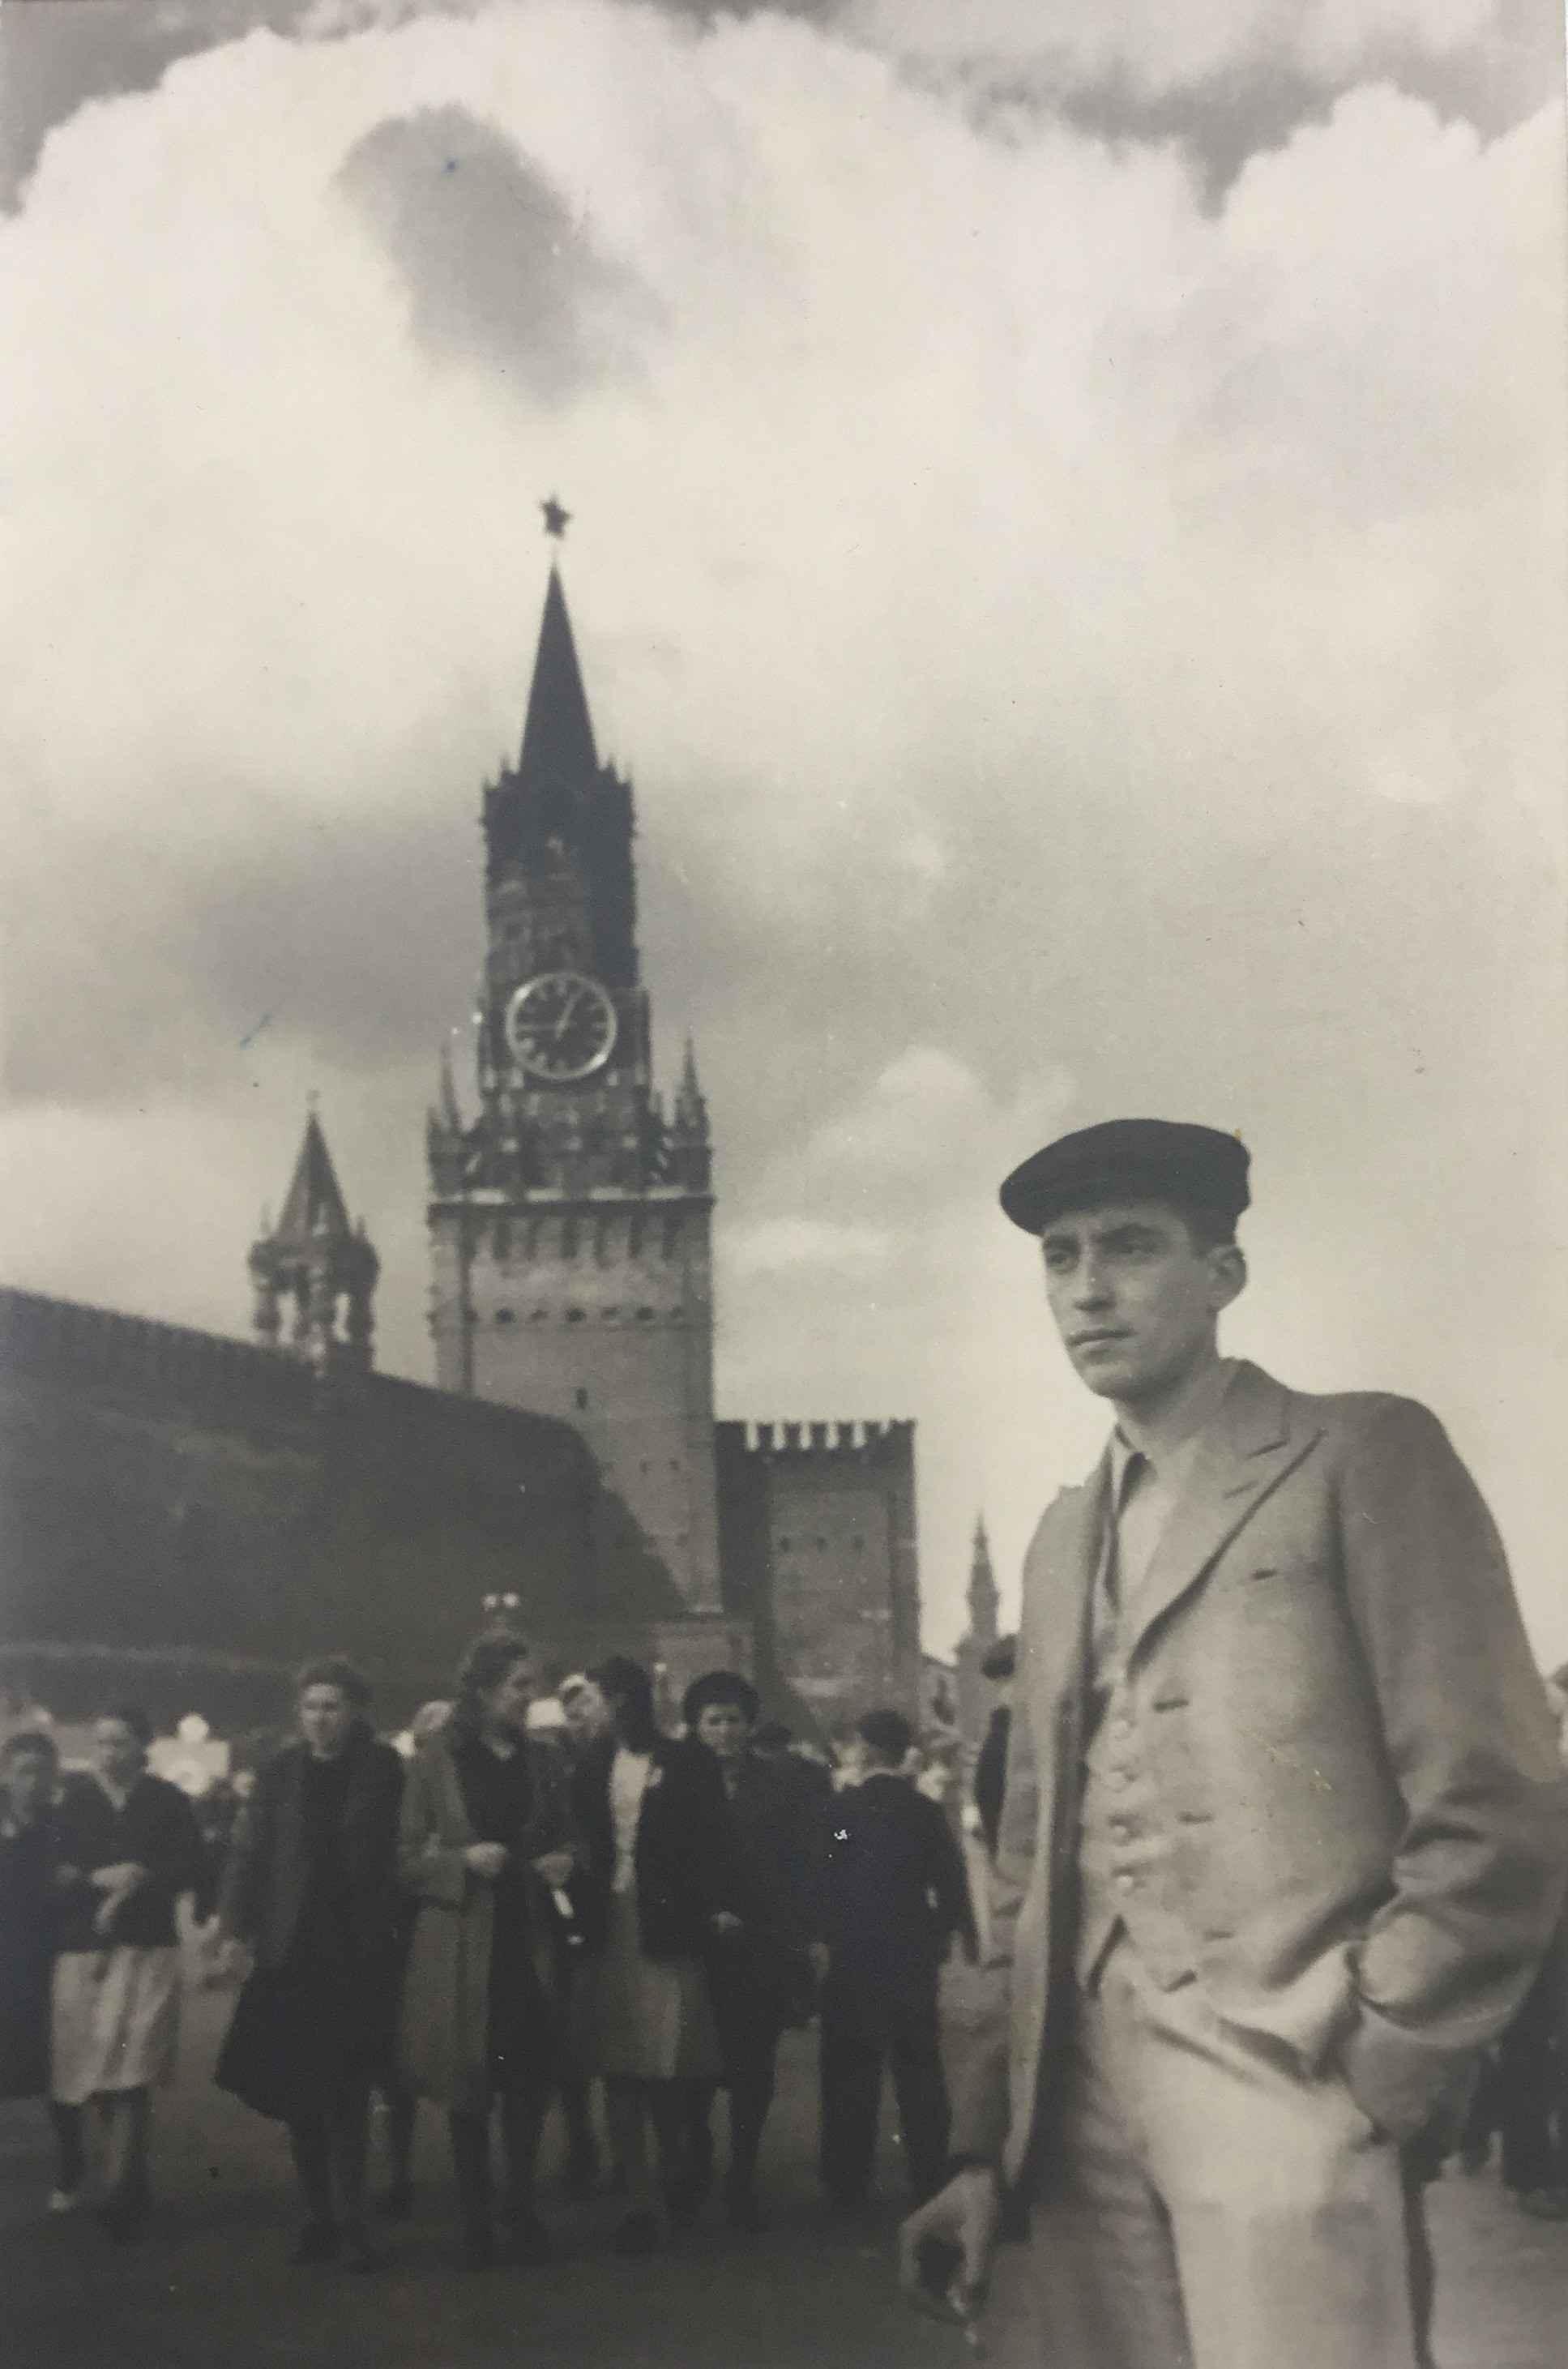 Экспонат #3. Асс. оператора Николай Шмаков. 1950 год